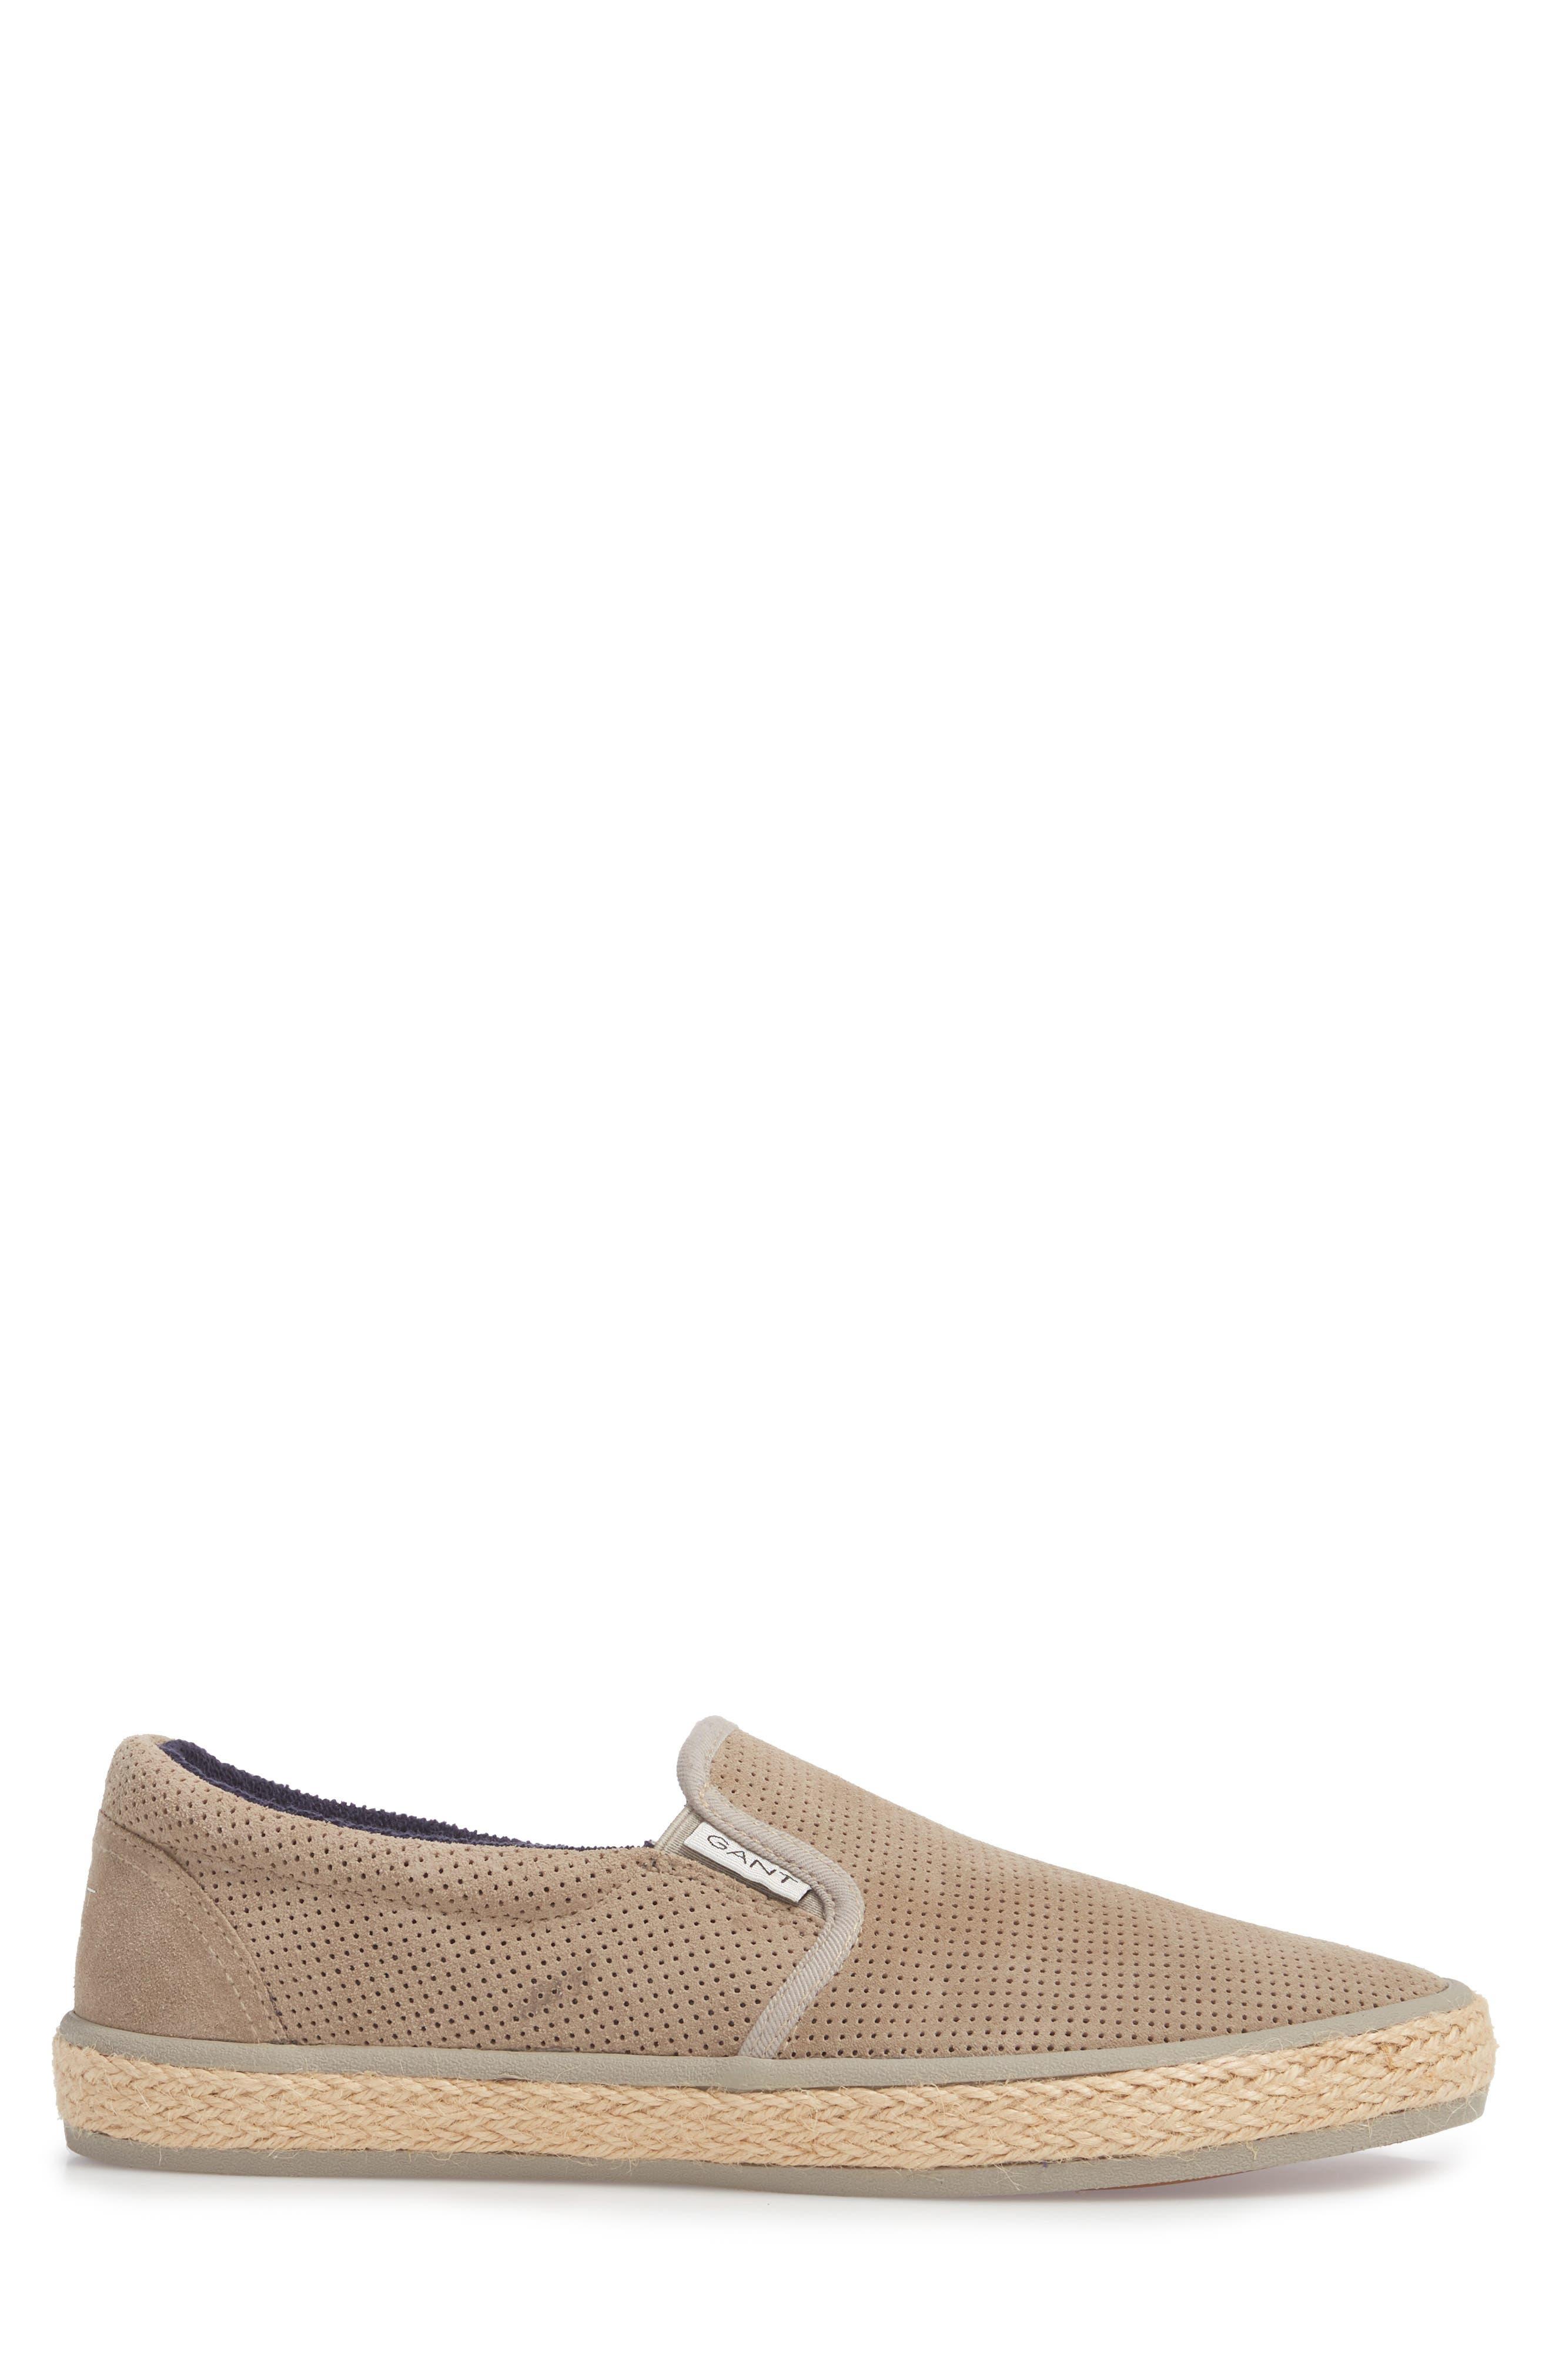 Master Perforated Slip-On Sneaker,                             Alternate thumbnail 3, color,                             209